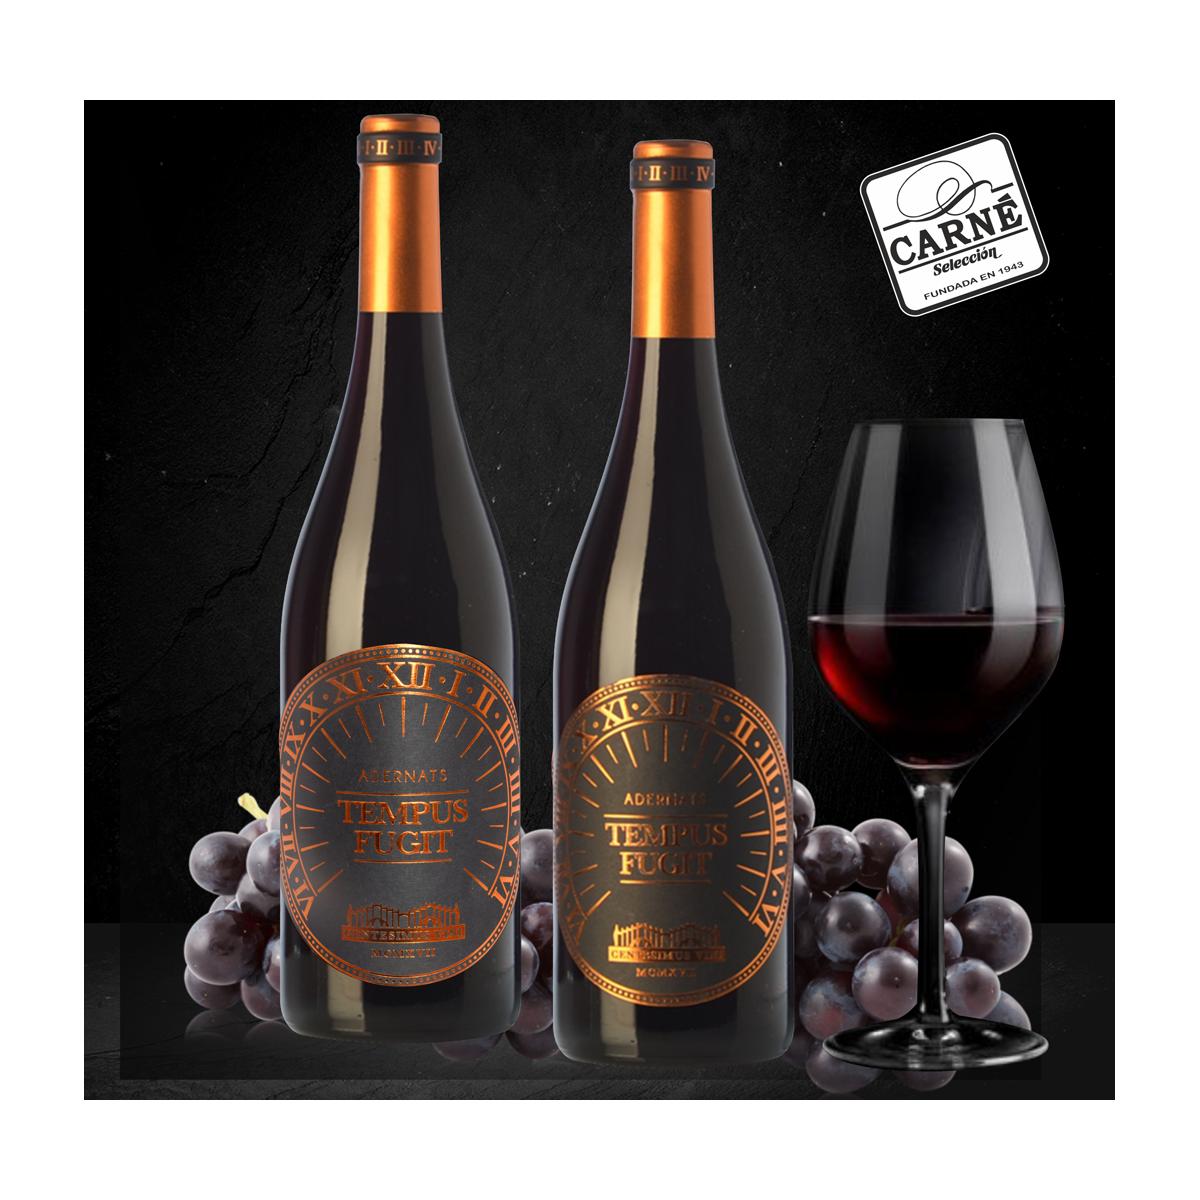 https://www.carneseleccion.com/7080-thickbox_default/es-88-2-botellas-vino-tinto-tempus-fugit.jpg